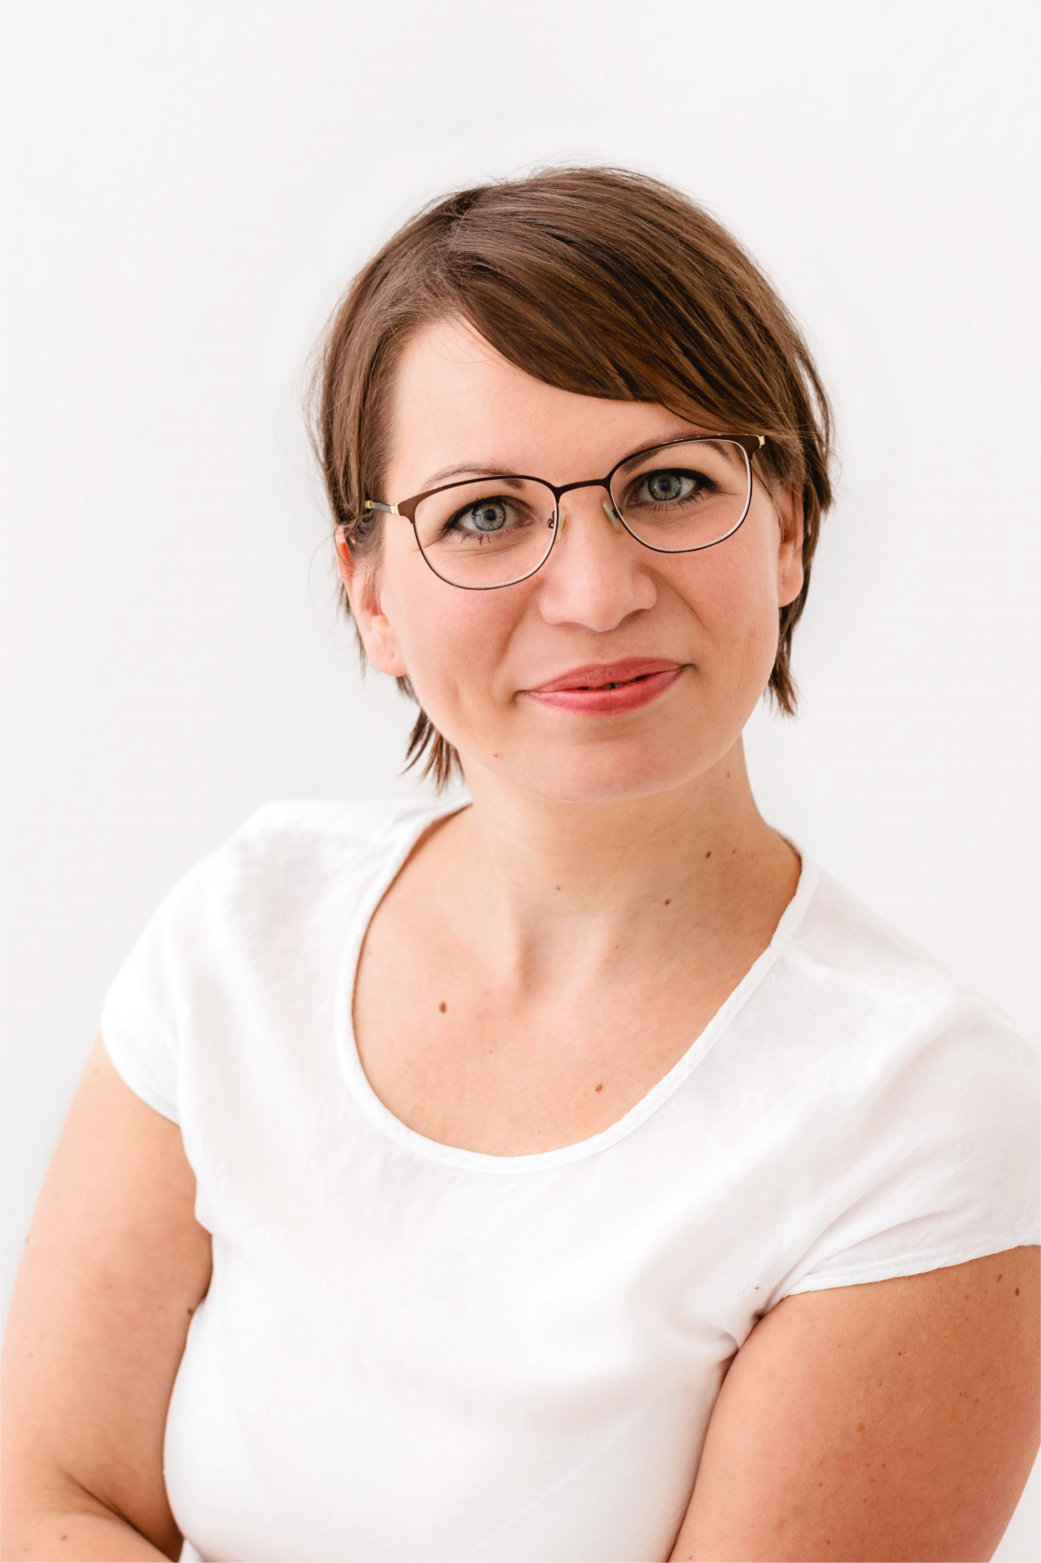 Tina Schoen